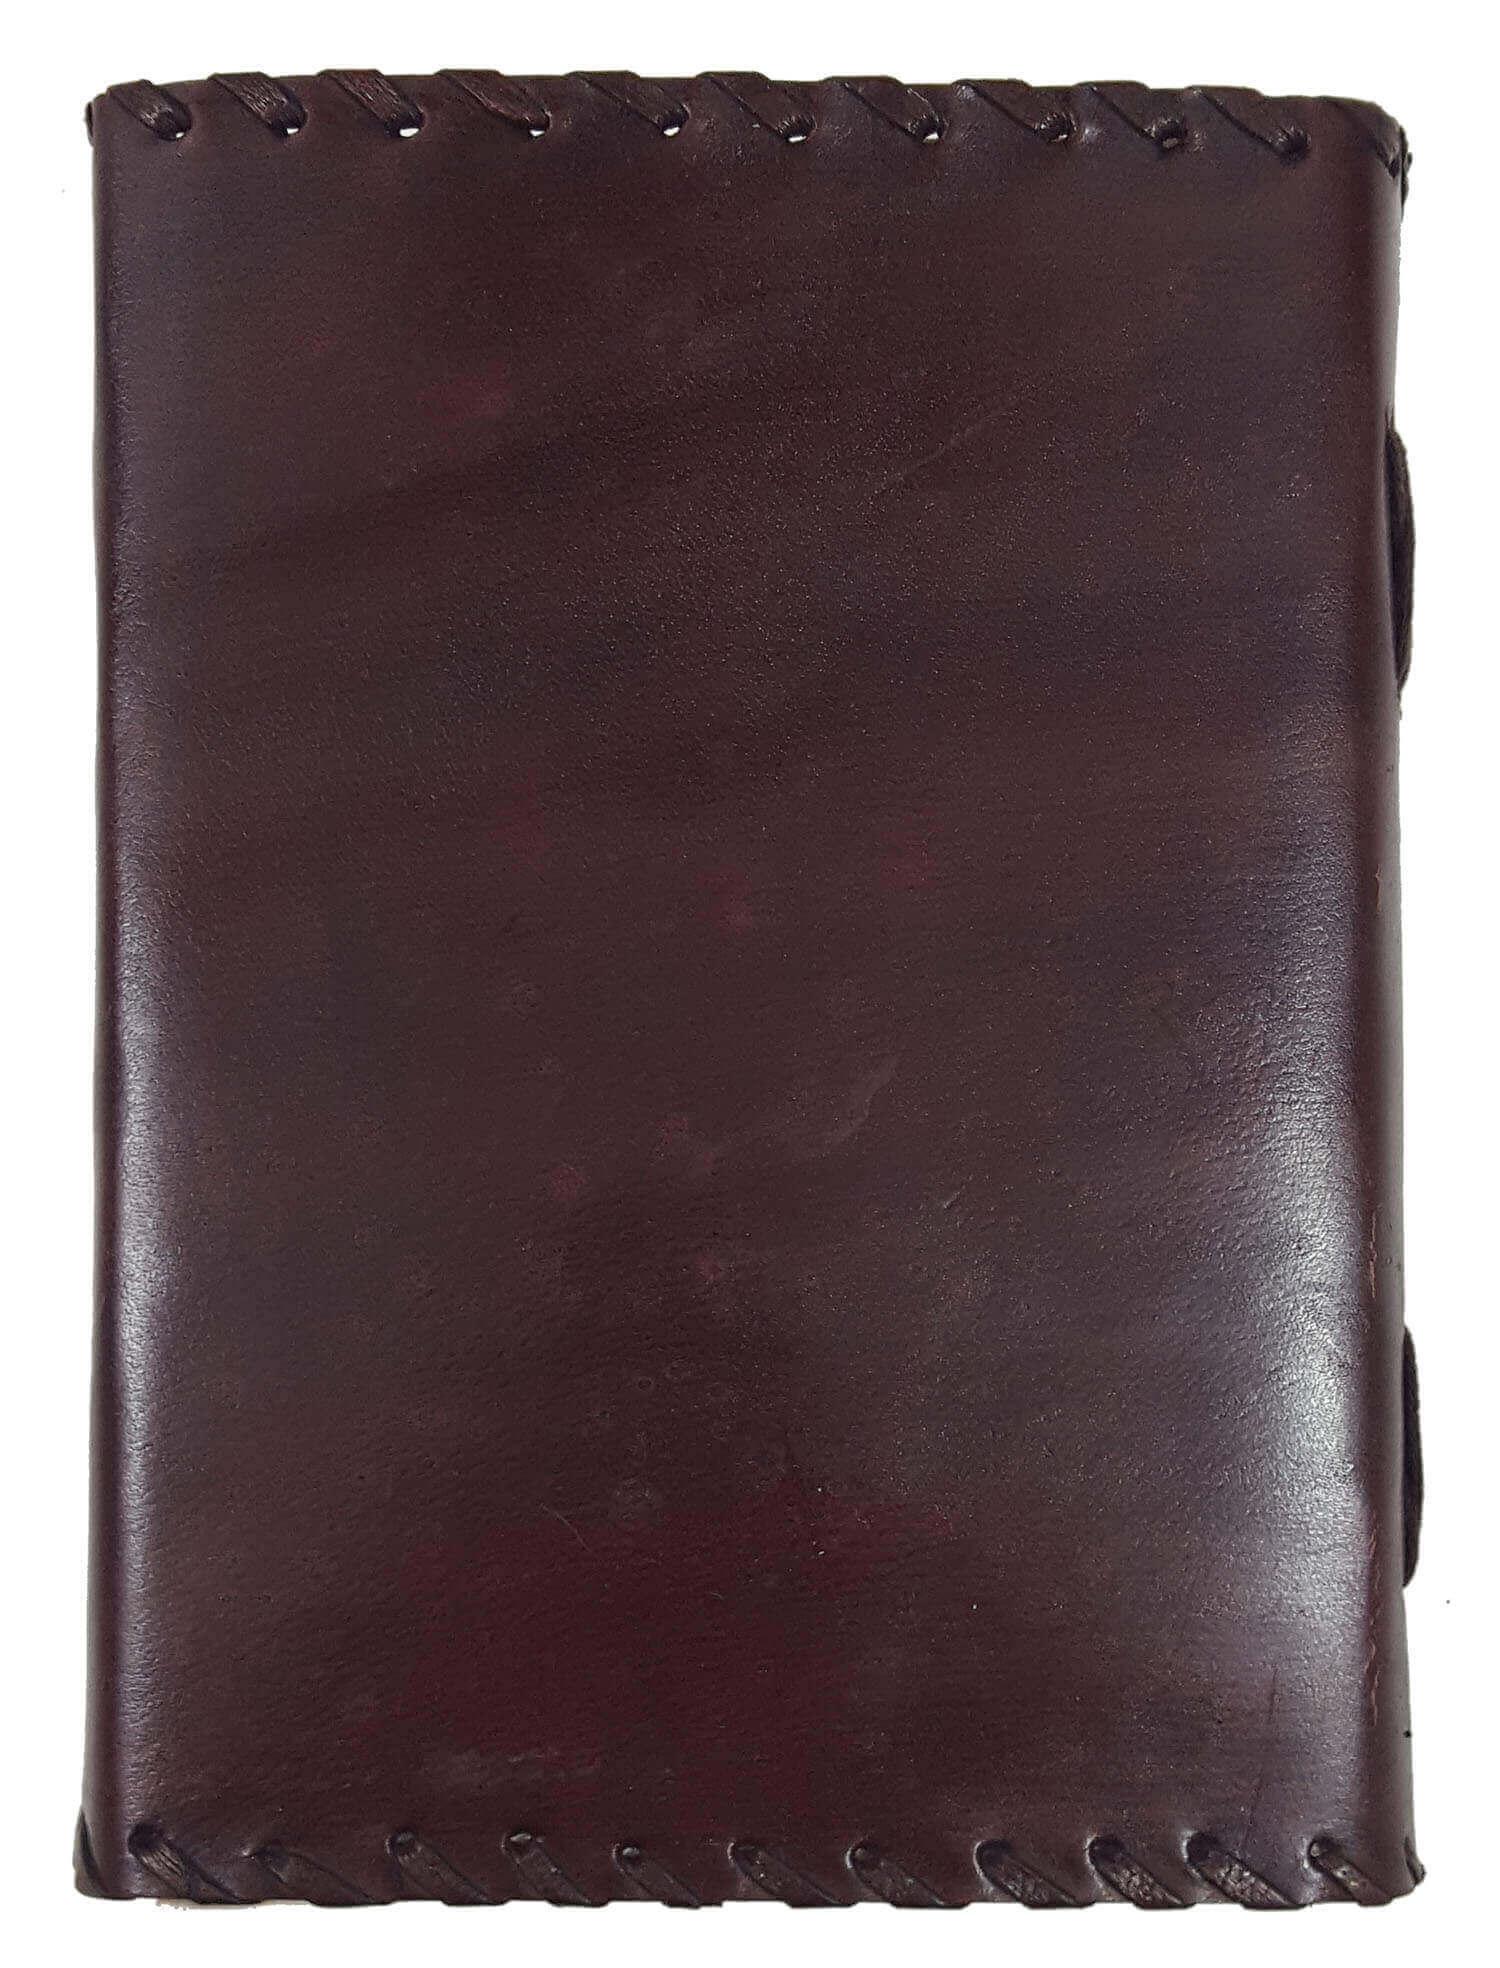 Plain Leather-Bound Journal